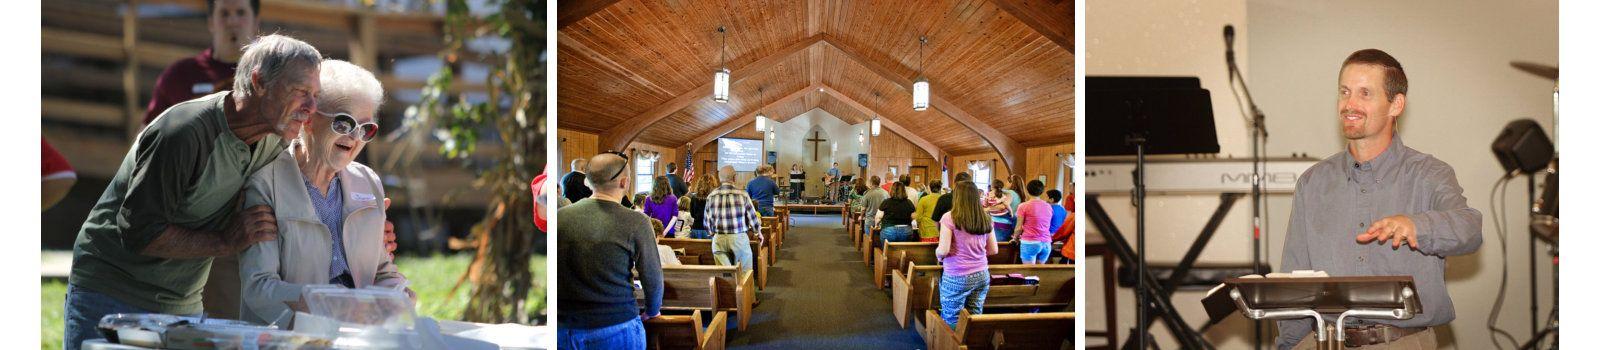 new-journey-church-in-belton-slide-1-c